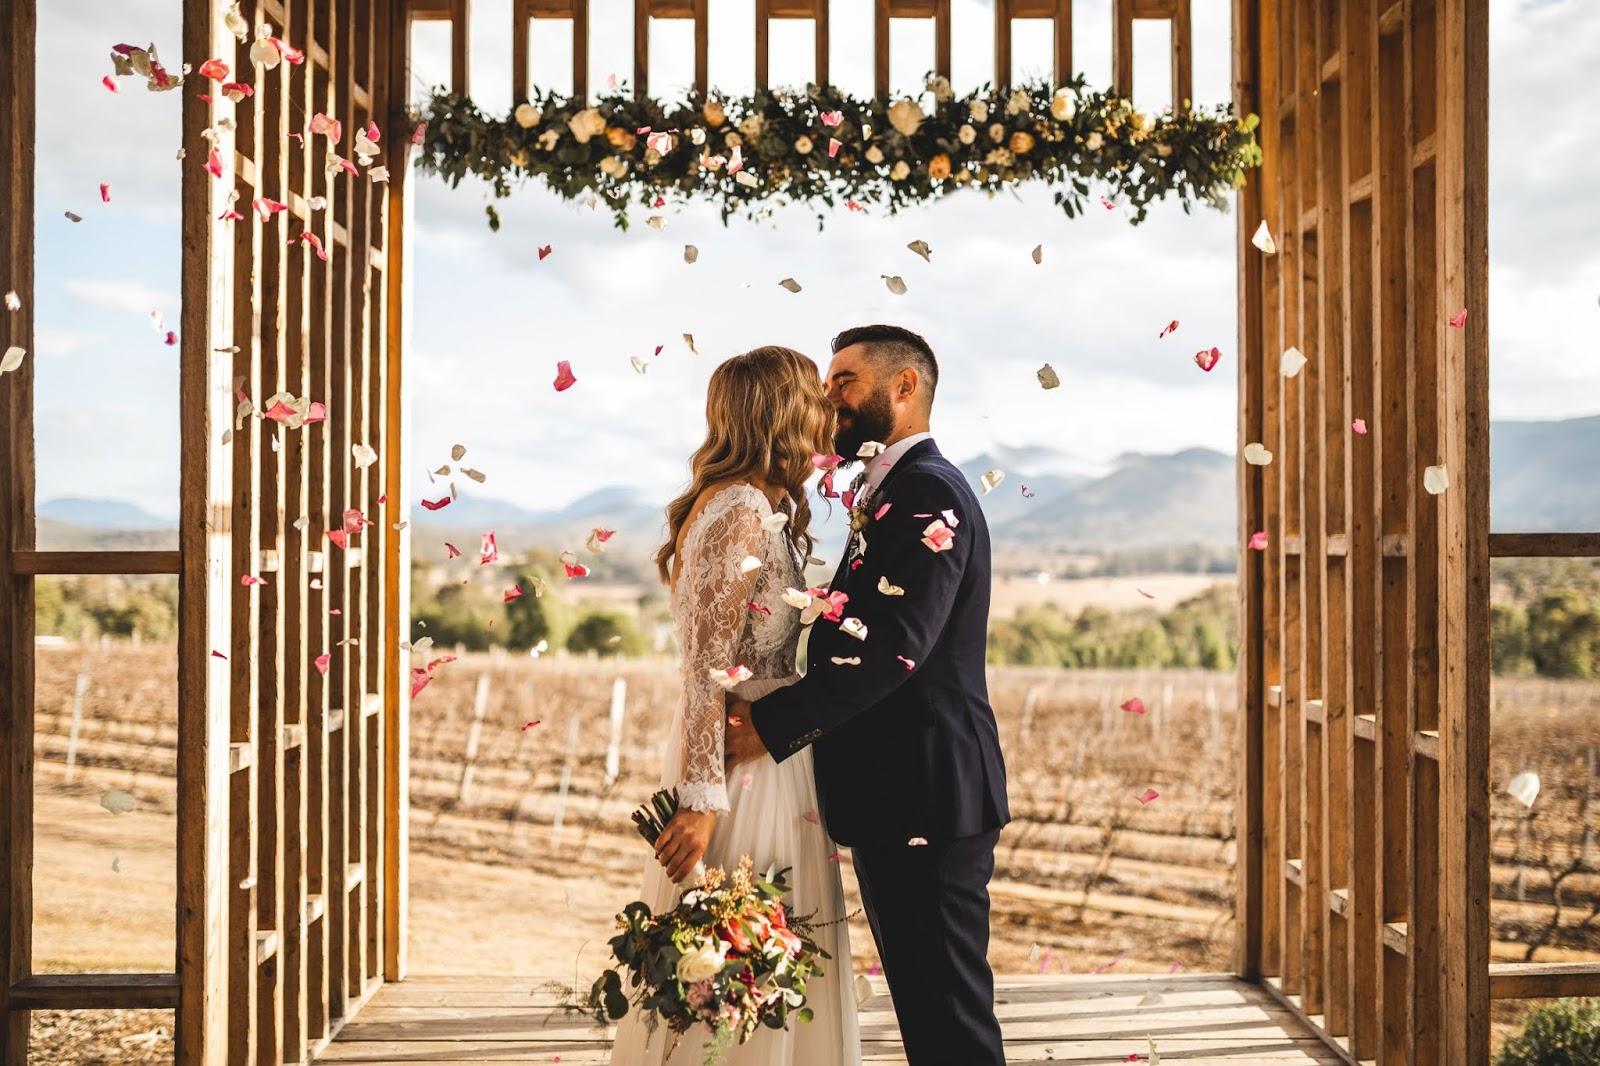 create photography wedding venues brisbane gold coast open air chapel